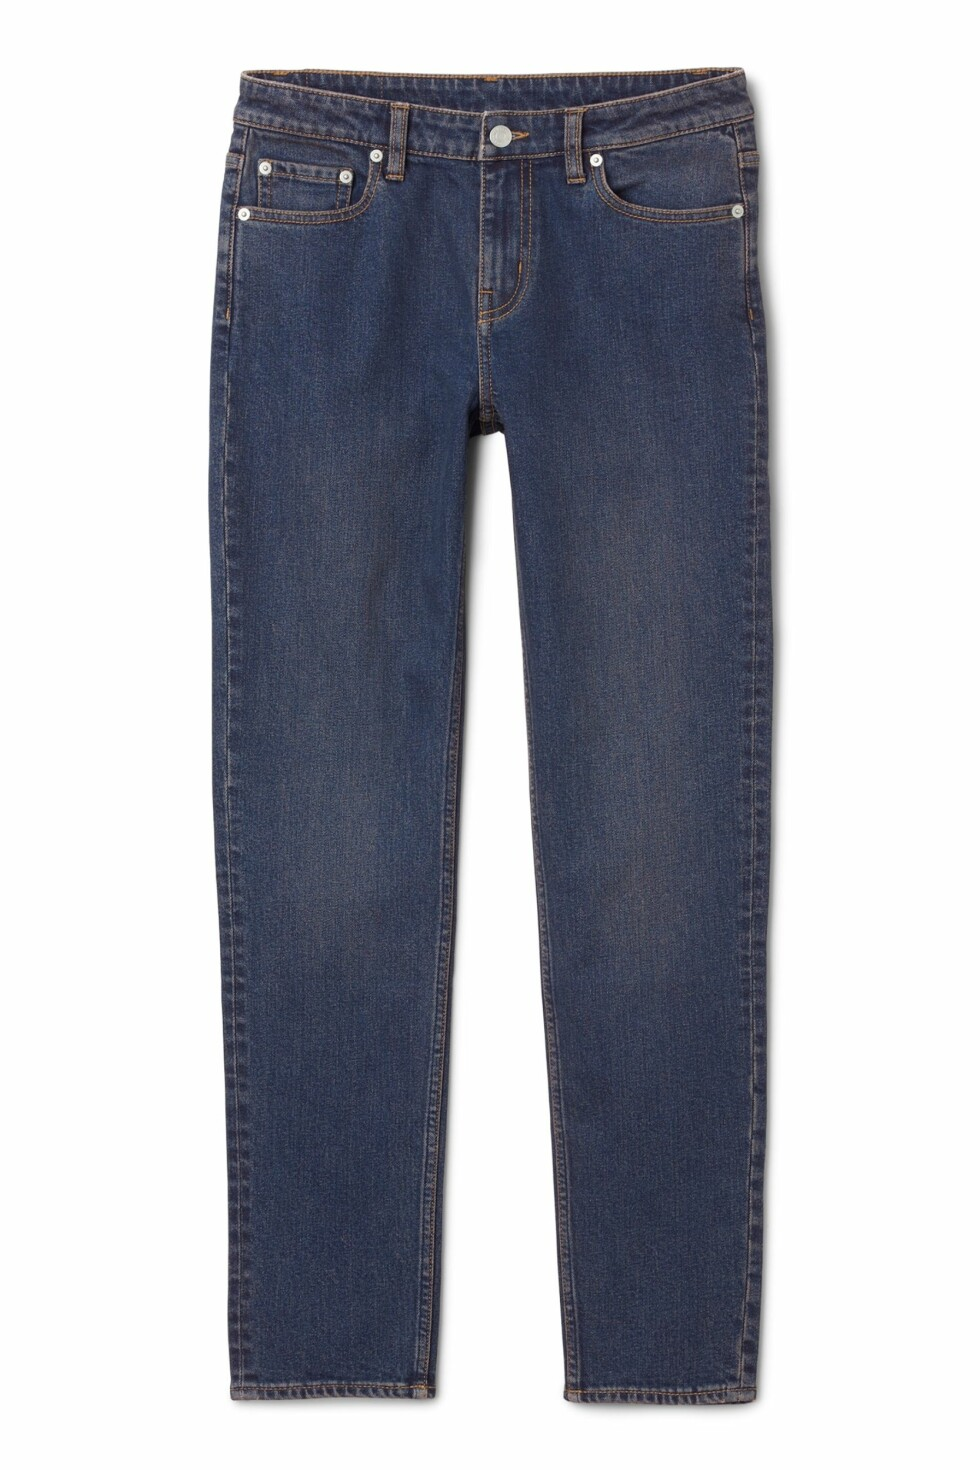 Jeans fra Weekday   kr 400   http://shop.weekday.com/dk/Womens_shop/New_arrivals/Beat_Car/1342358-8823450.1?image=1328240#c-47958